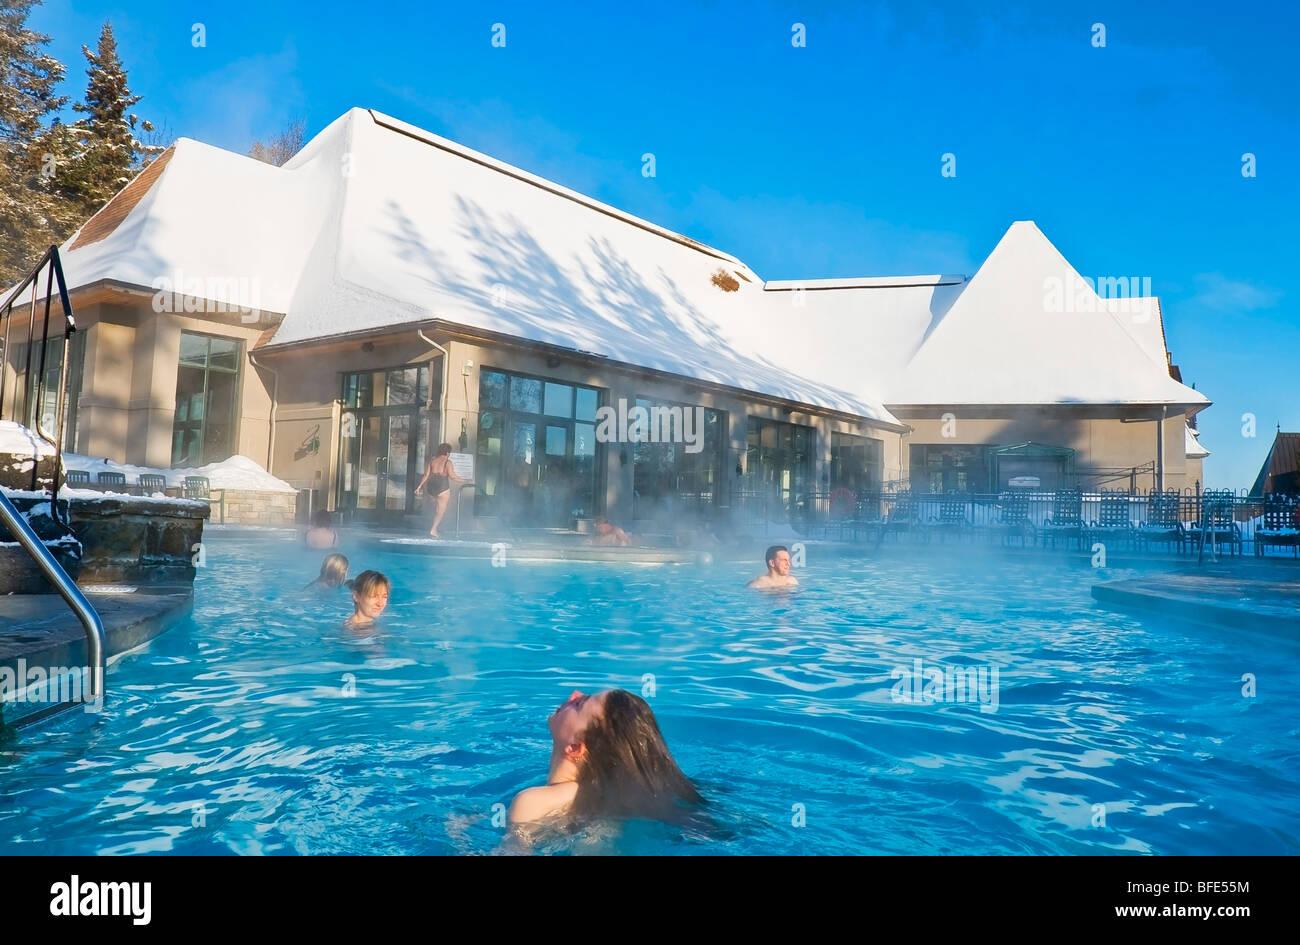 Swimming Pool In Winter Stockfotos & Swimming Pool In Winter Bilder ...